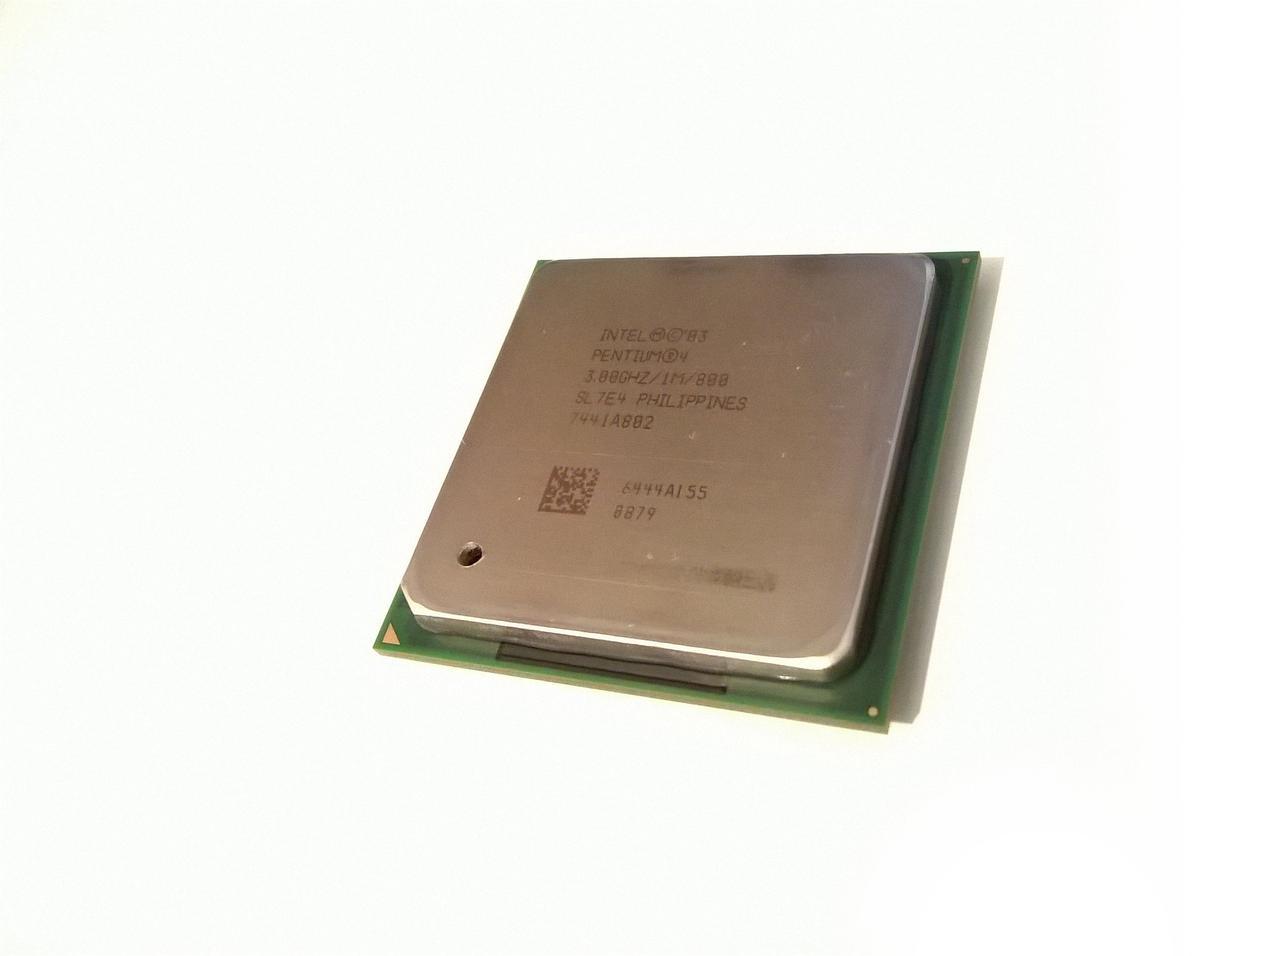 Процессор Intel Pentium 4 3.00GHz/1M/800 (SL7E4) s478, tray